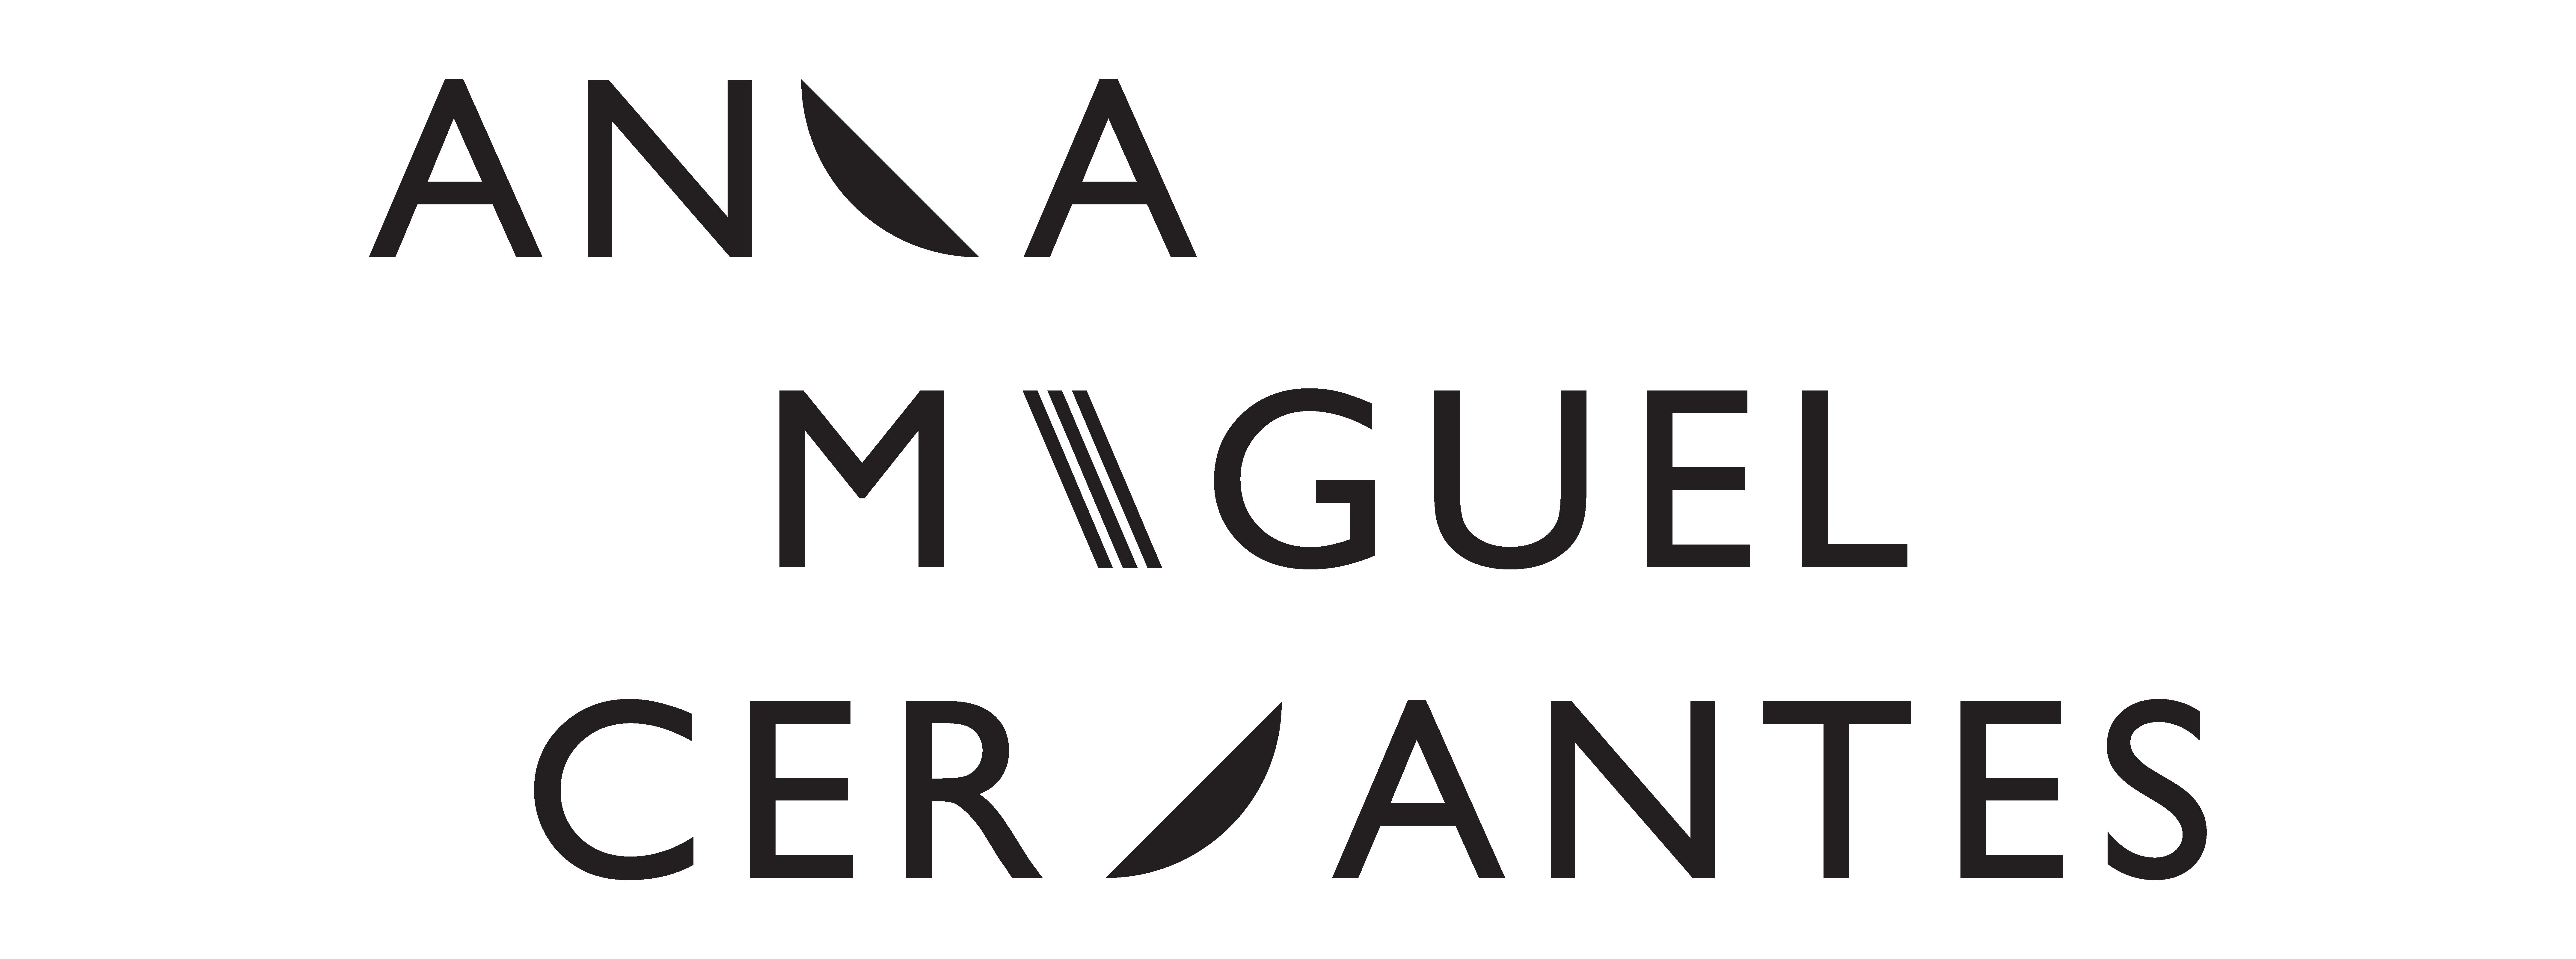 Anna Miguel Cervantes